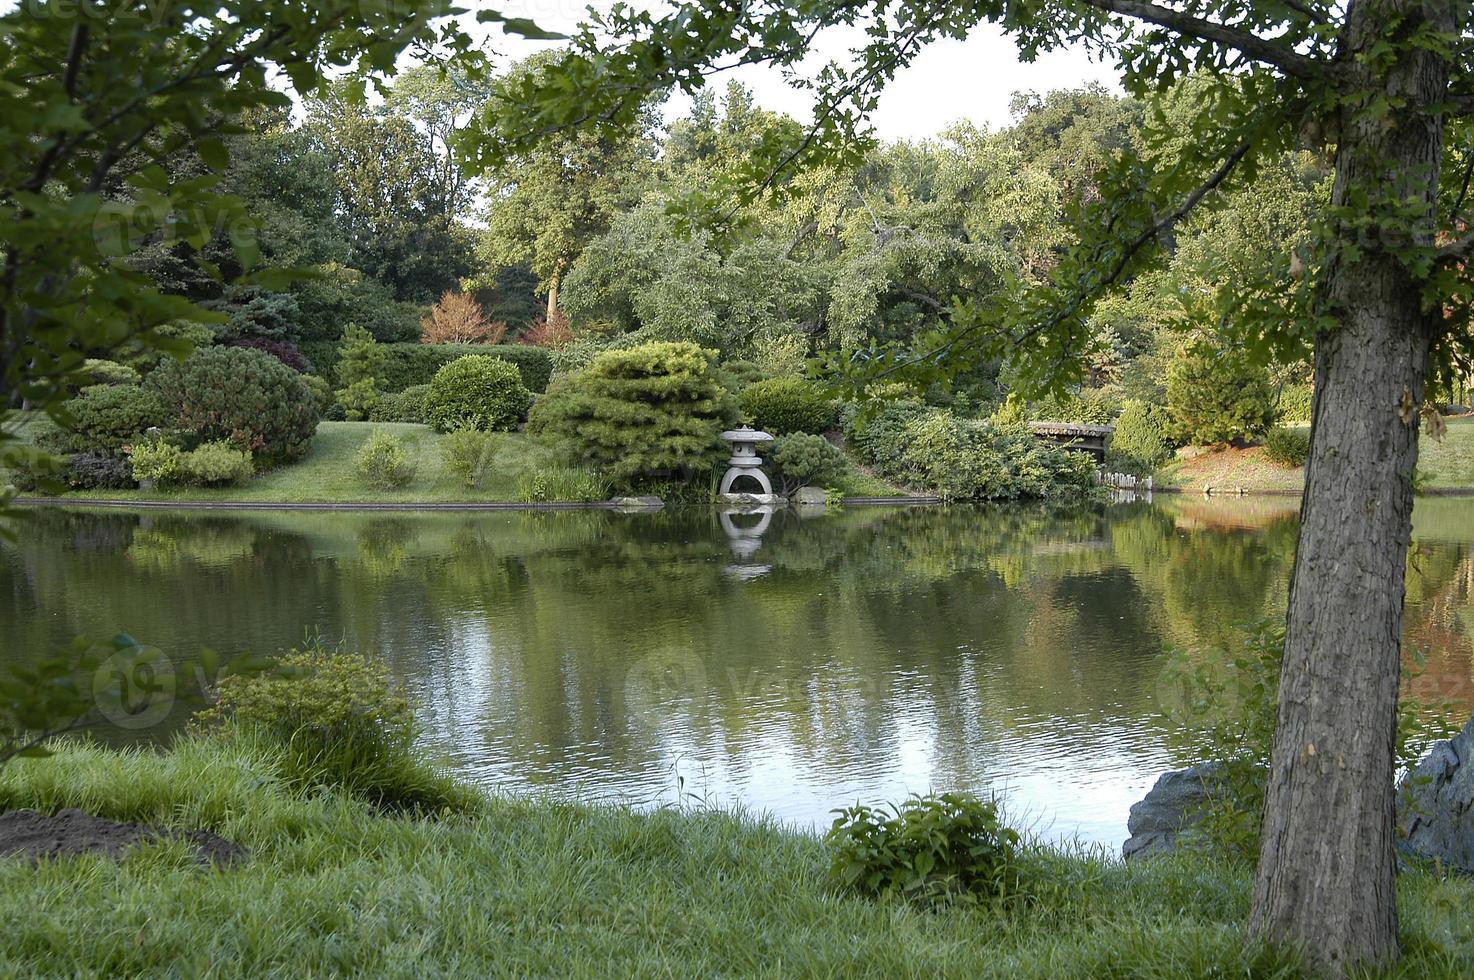 Scenic View of Japanese Garden Lake no0531 photo